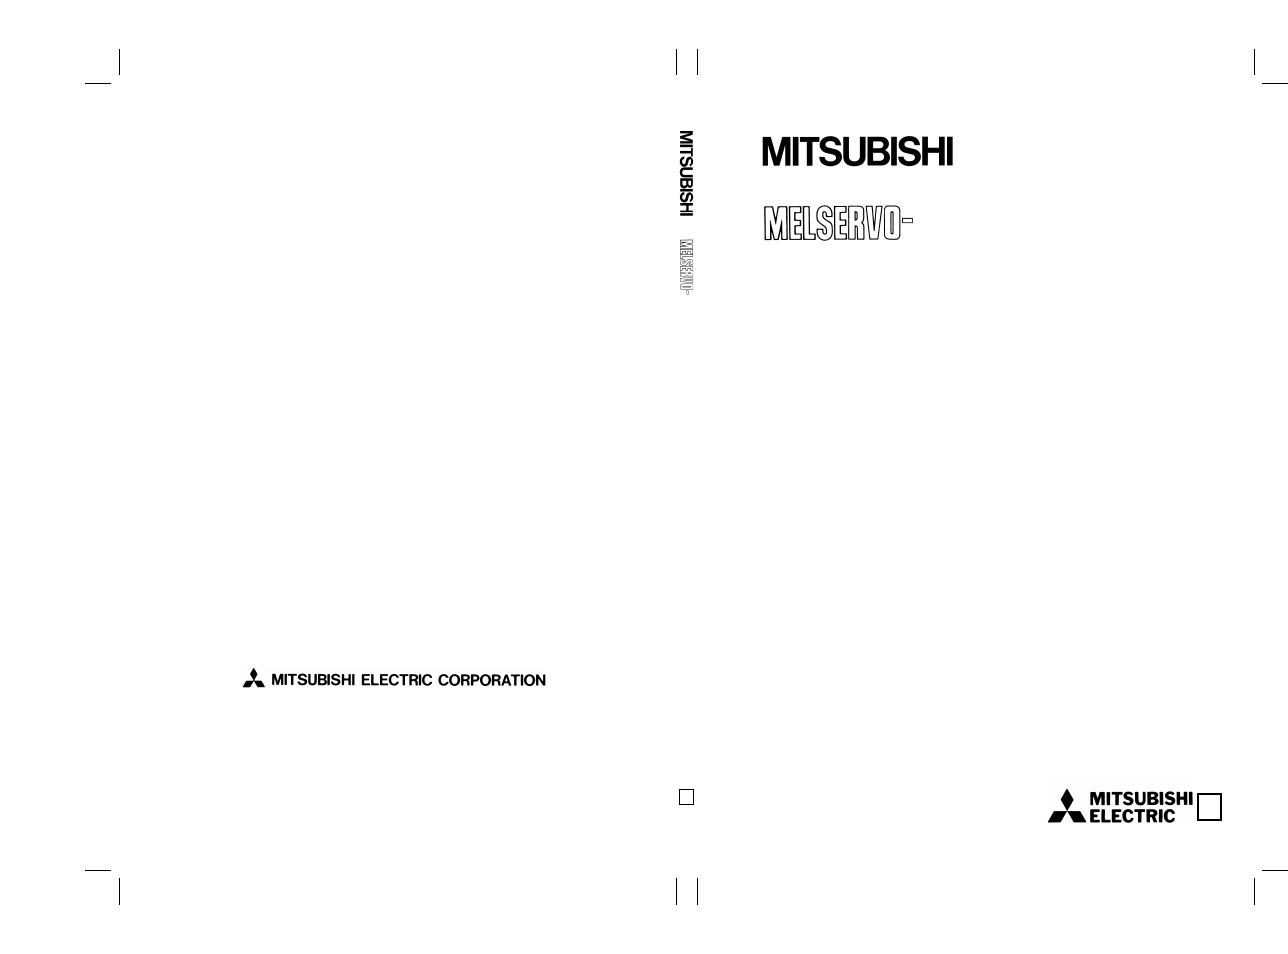 Mitsubishi Electric J2